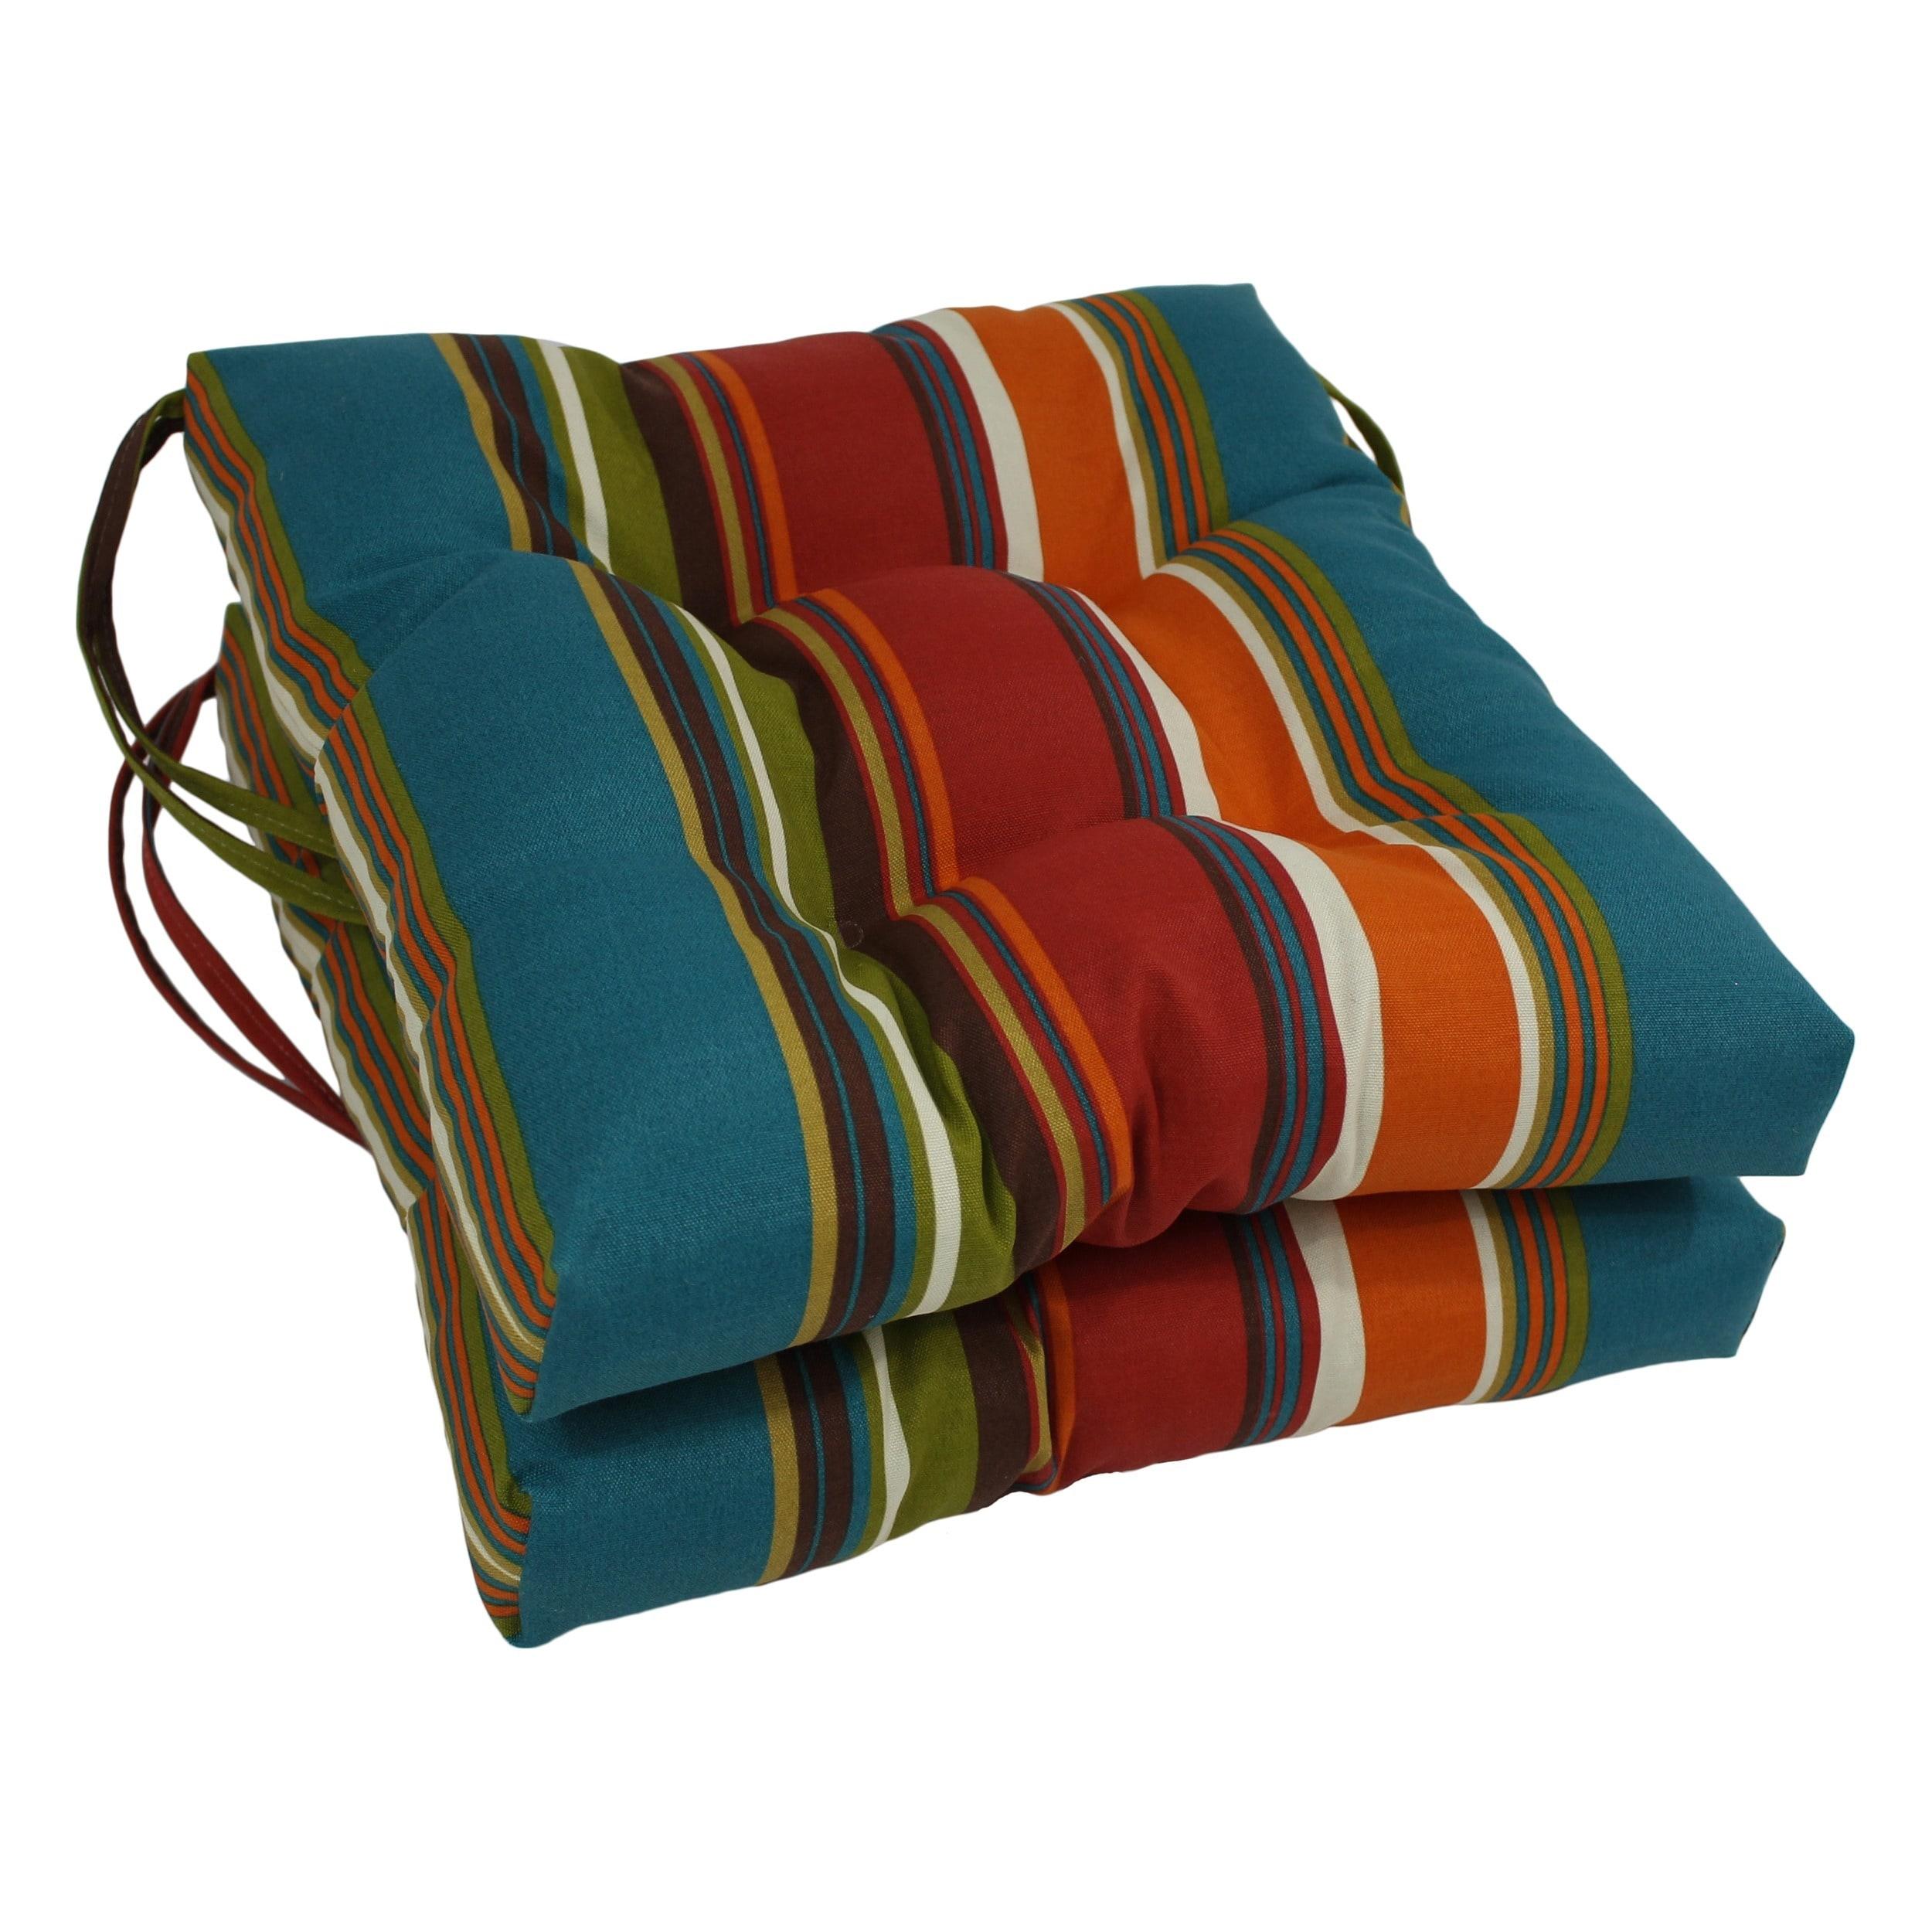 Blazing Needles 16 Inch Indoor Outdoor Chair Cushion Set Of 2 X